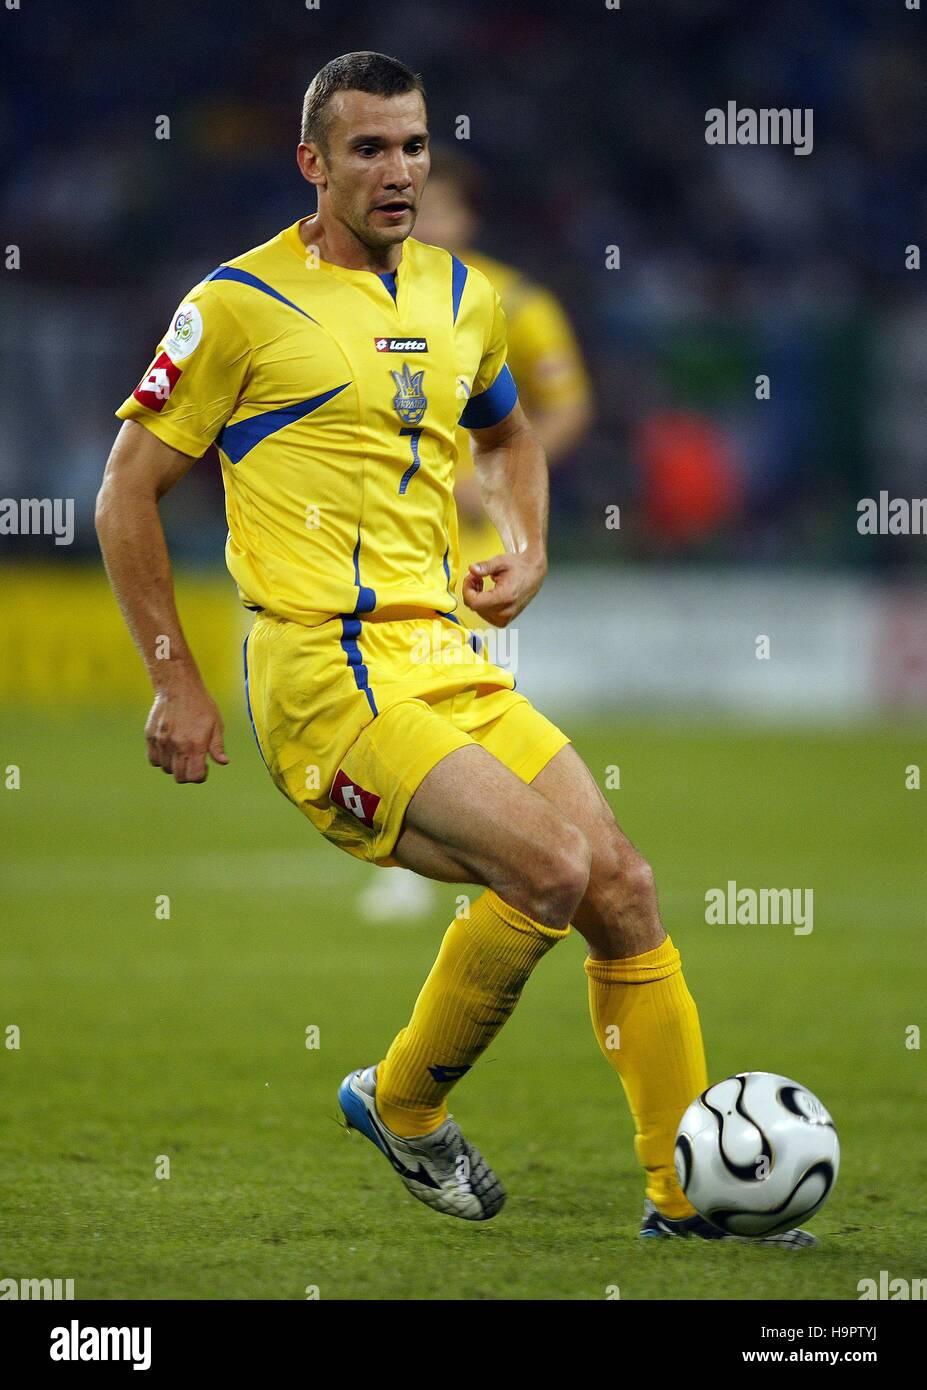 ANDRIY SHEVCHENKO UKRAINE & CHELSEA FC WORLD CUP AOL ARENA HAMBURG